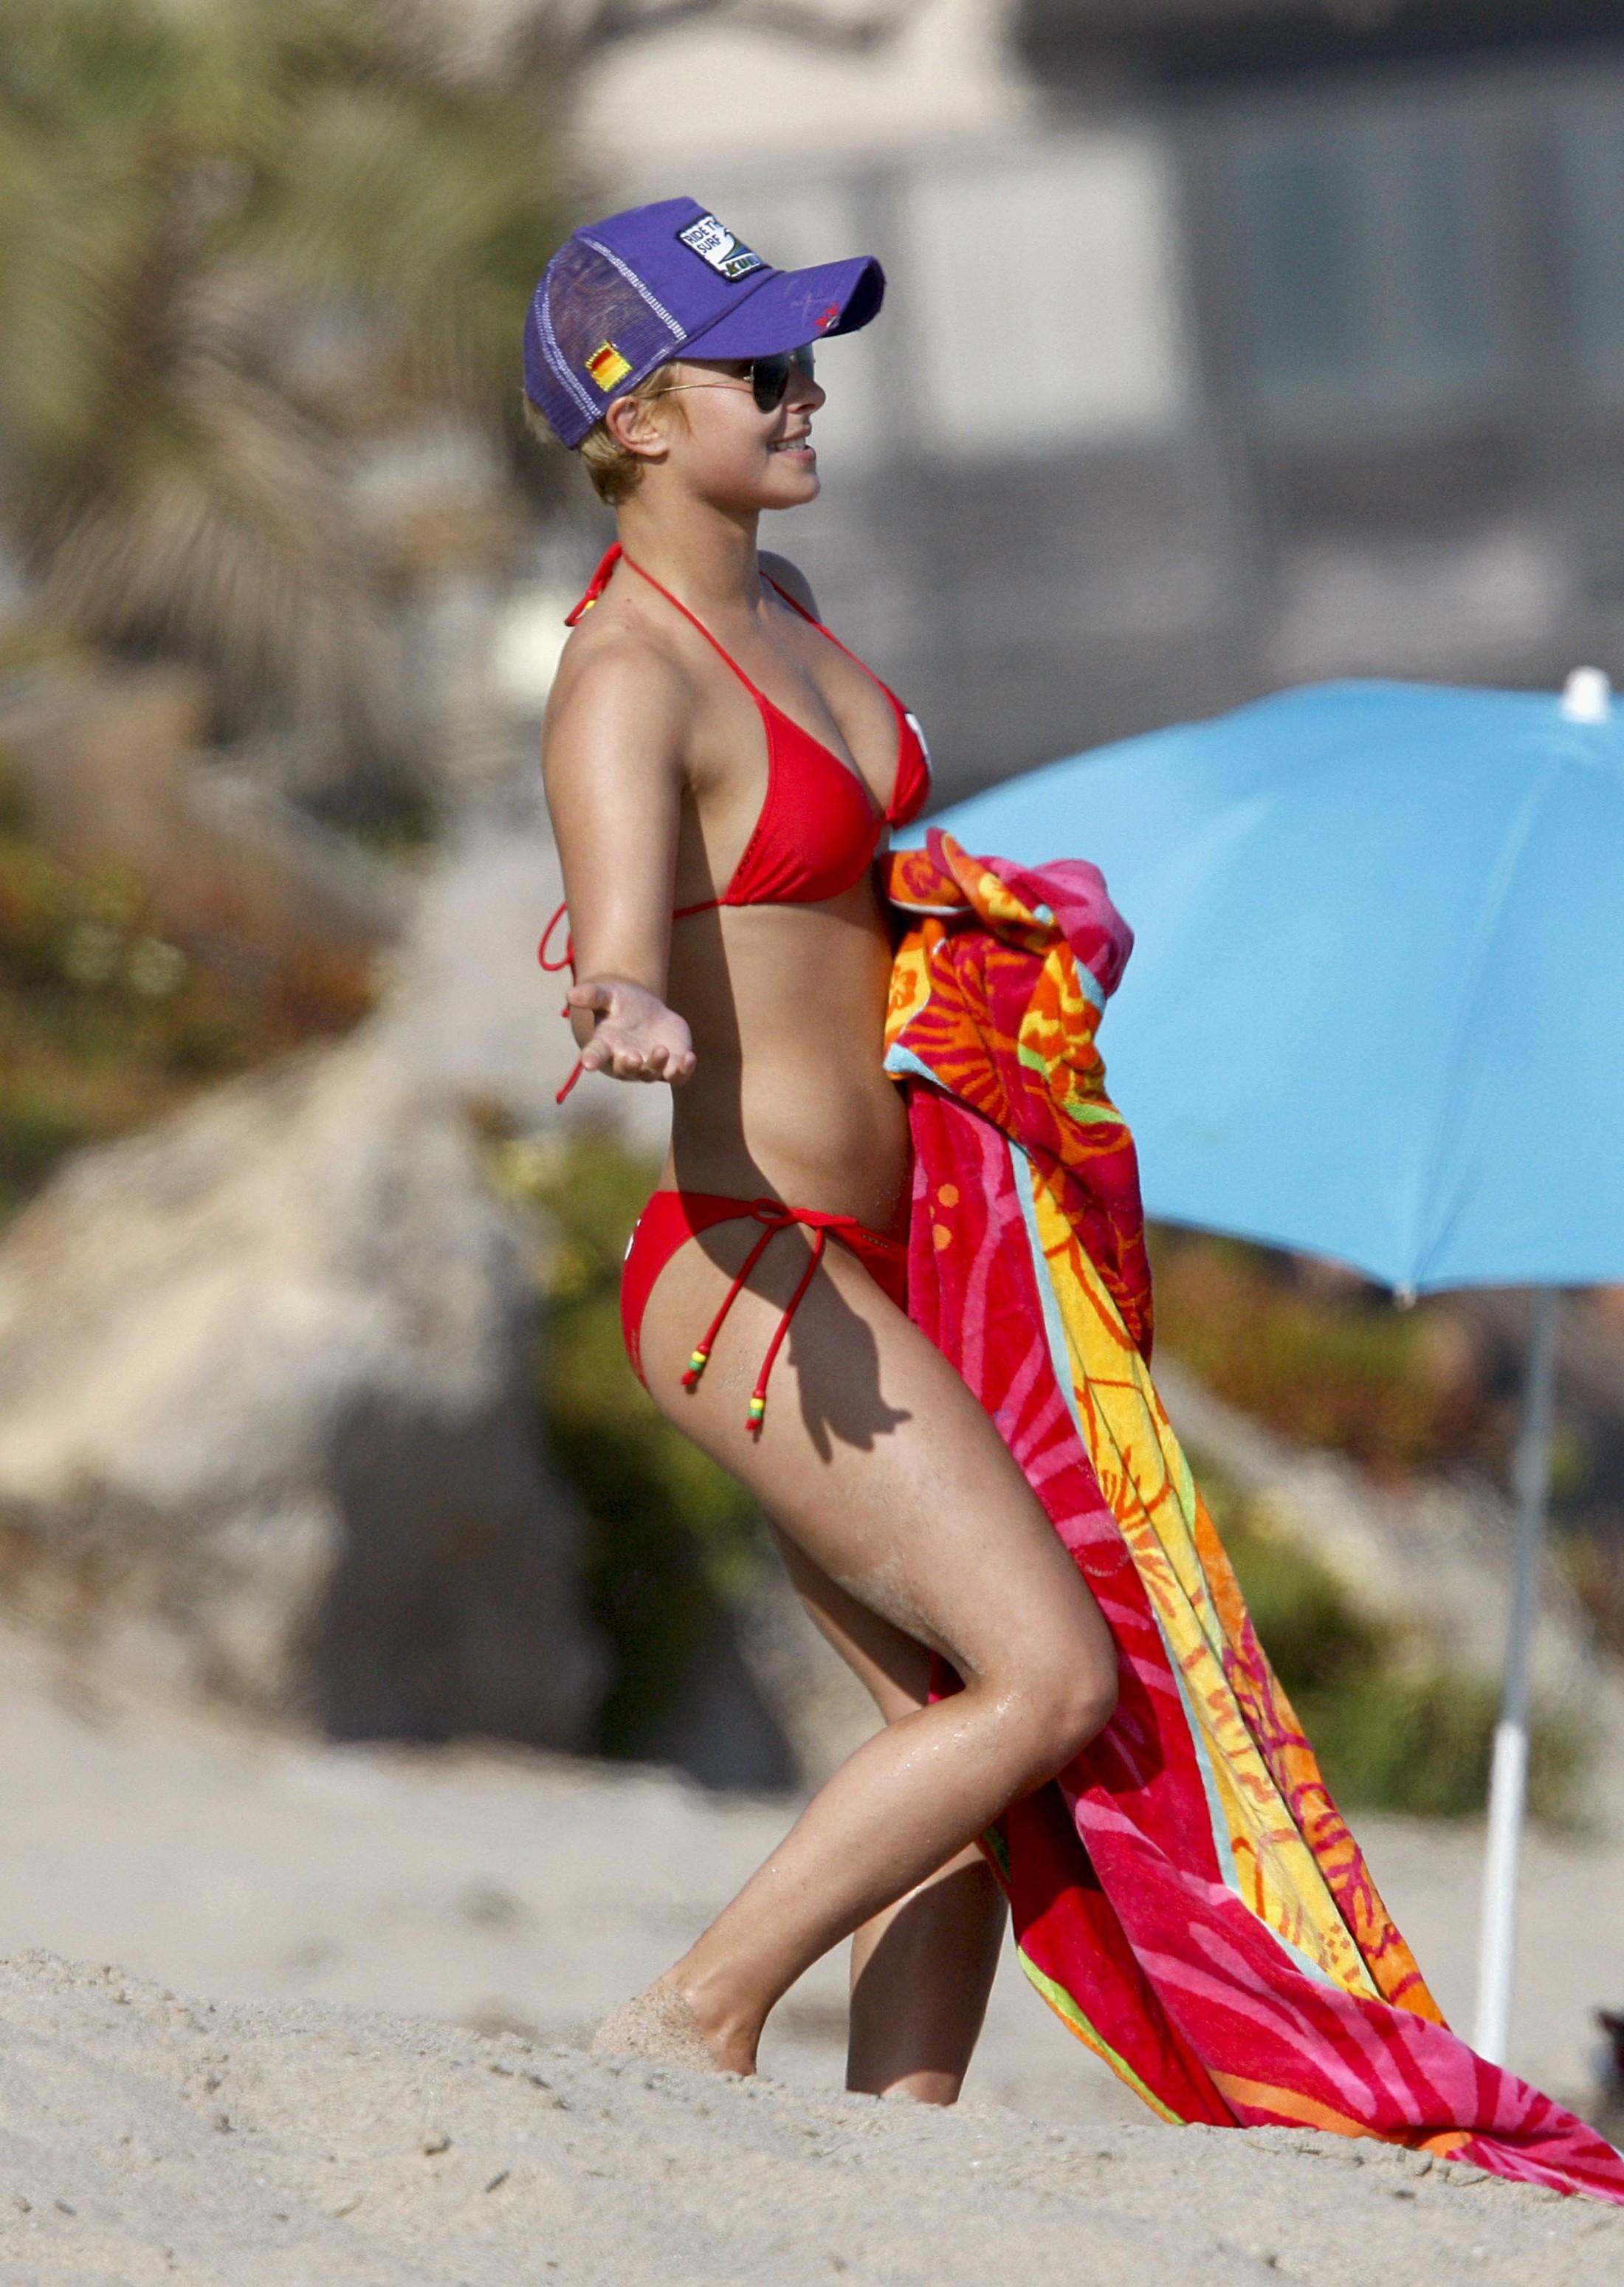 Hayden Panettiere in Red Hello Kitty bikini on beach in Malibu ? 45 HQ Pics